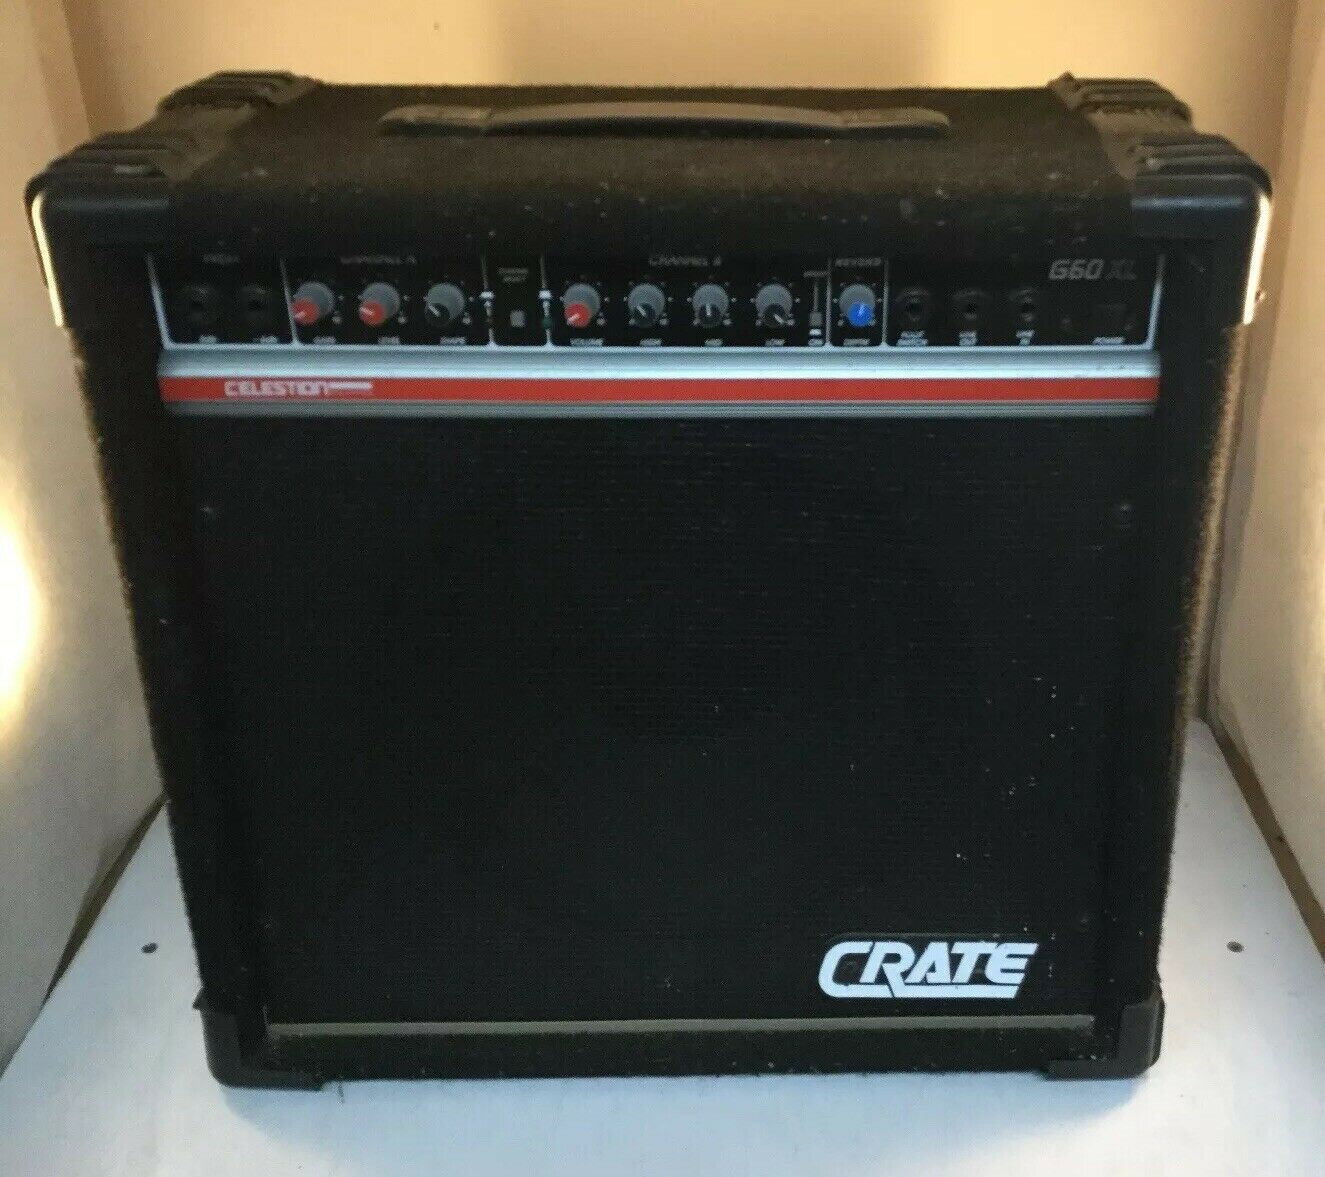 Crate G60-XL Celestion G12M-70 Guitar Amp